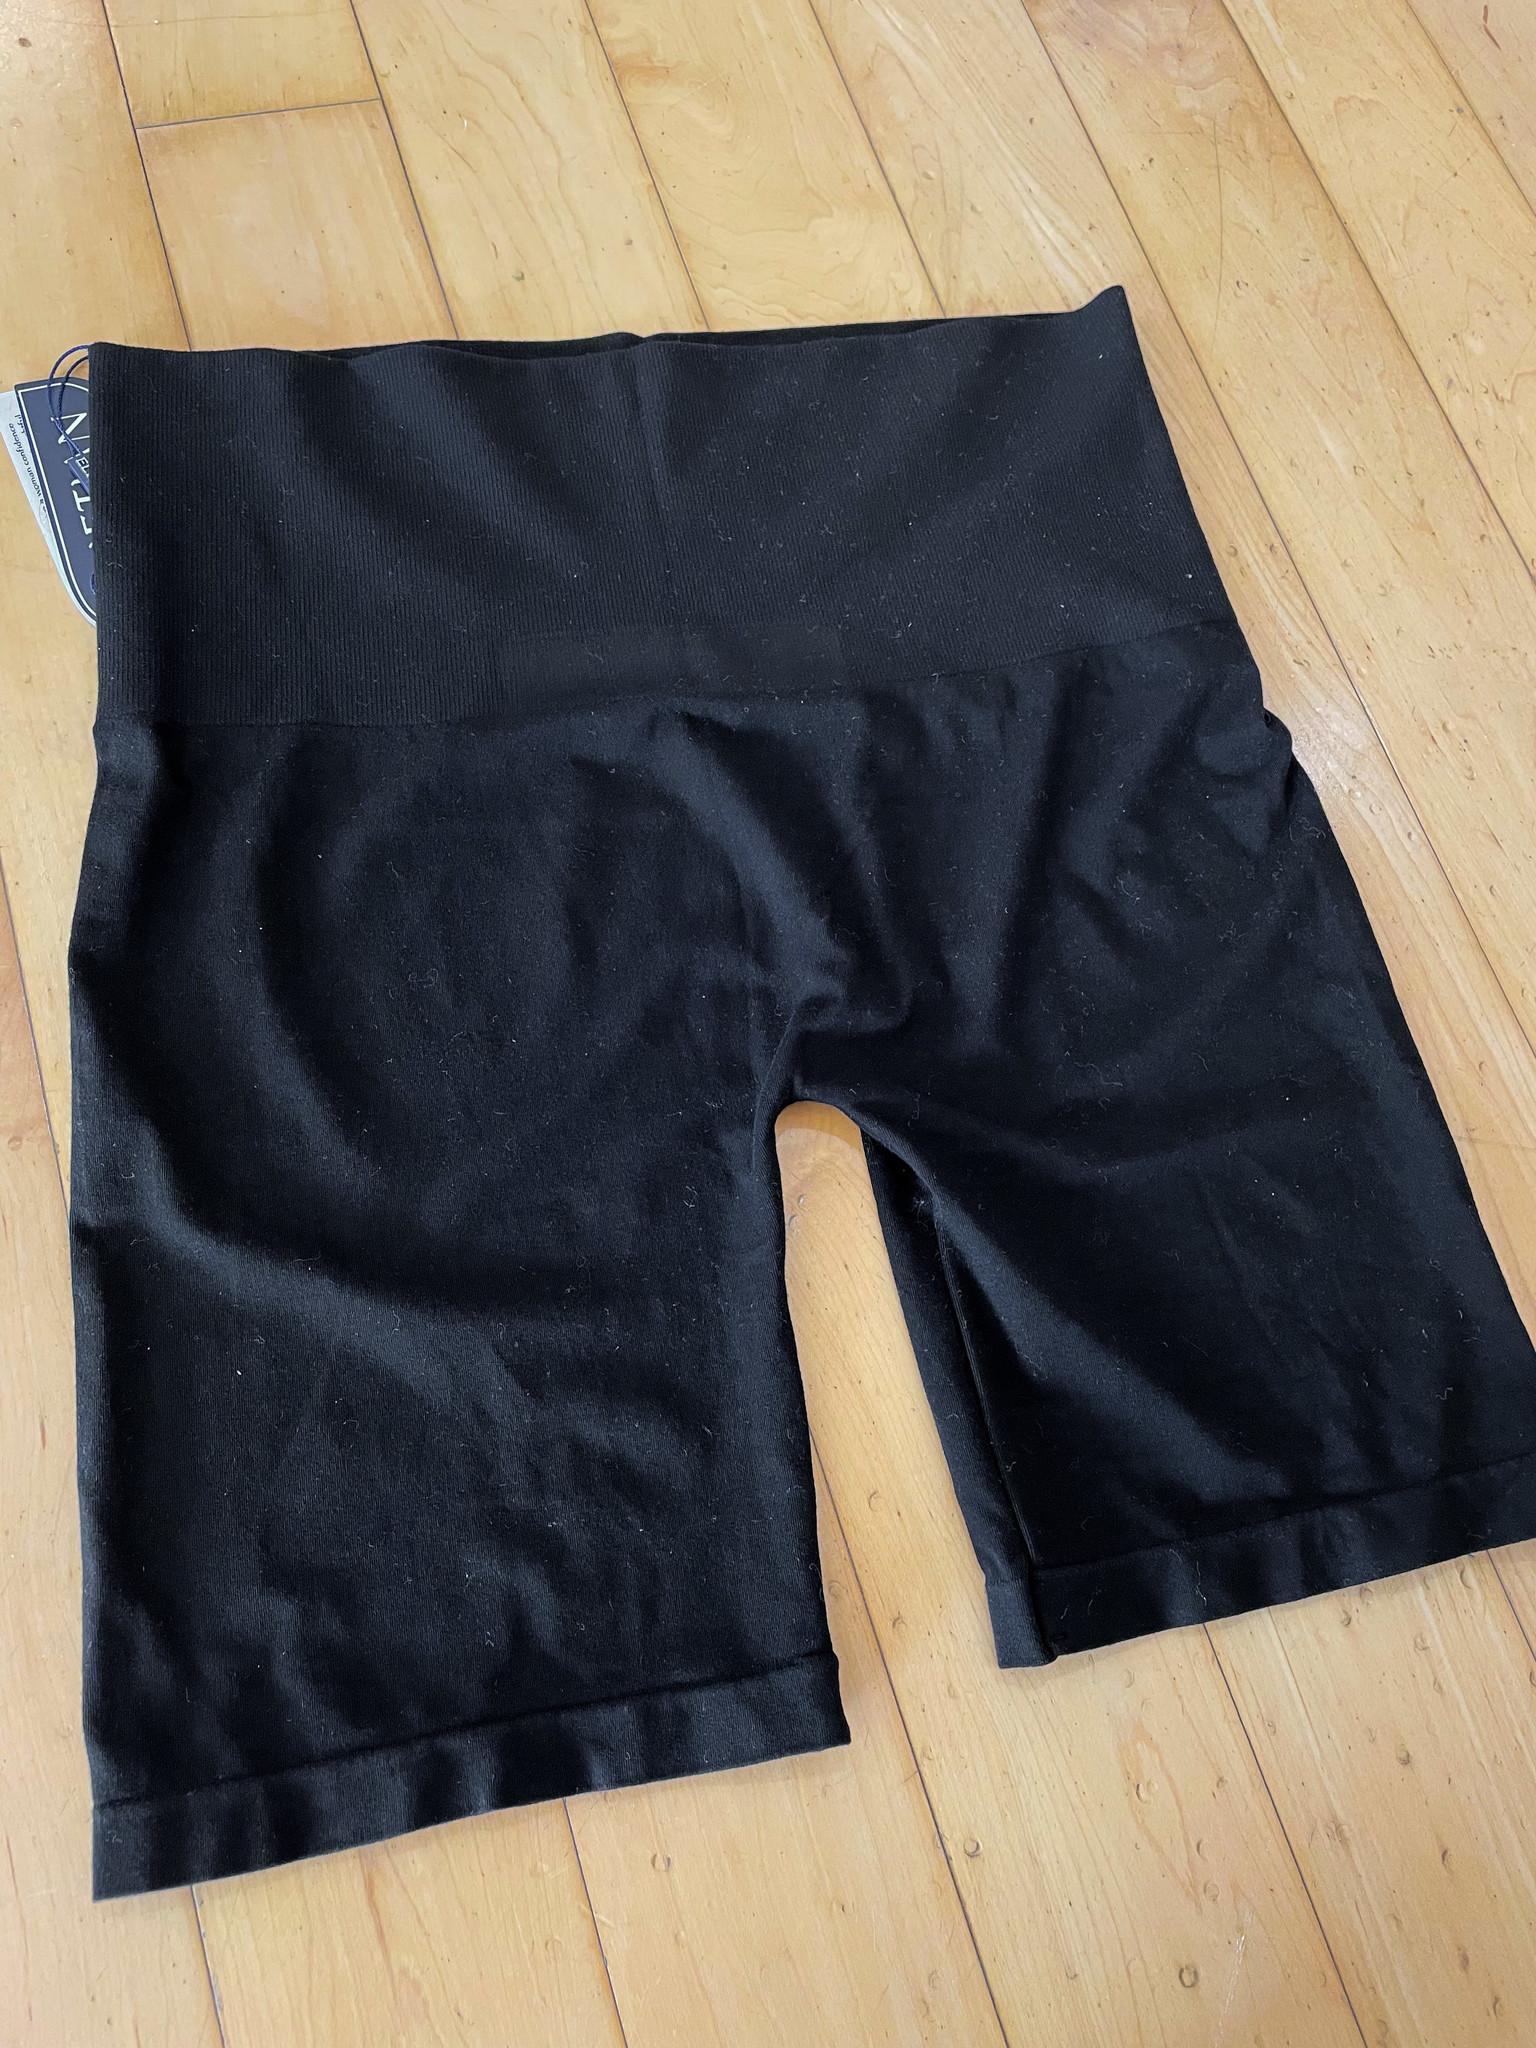 Black Extended Fit High Waist Tummy Control Biker Shorts